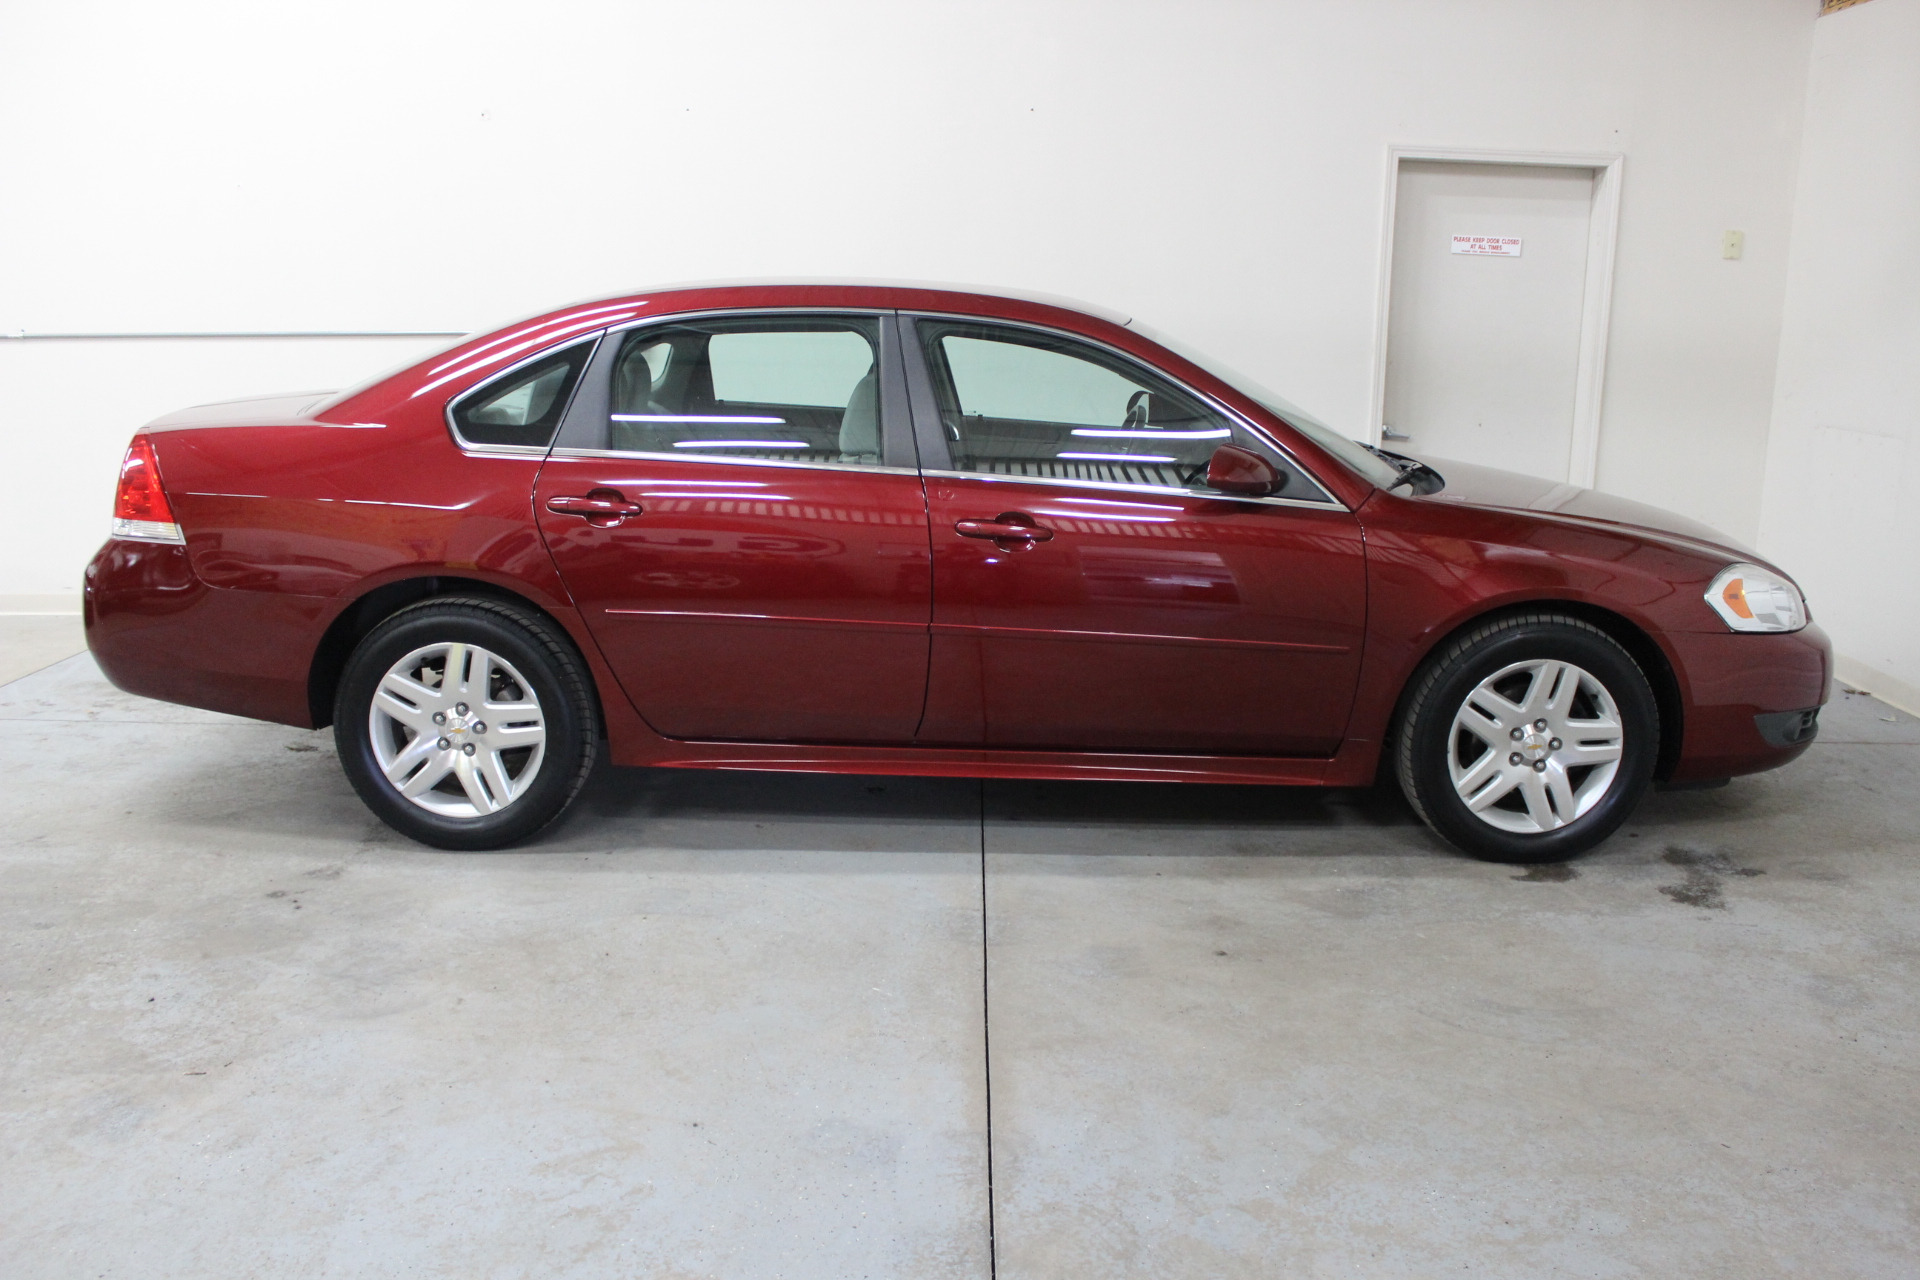 2011 chevrolet impala lt fleet biscayne auto sales pre owned dealership ontario ny. Black Bedroom Furniture Sets. Home Design Ideas